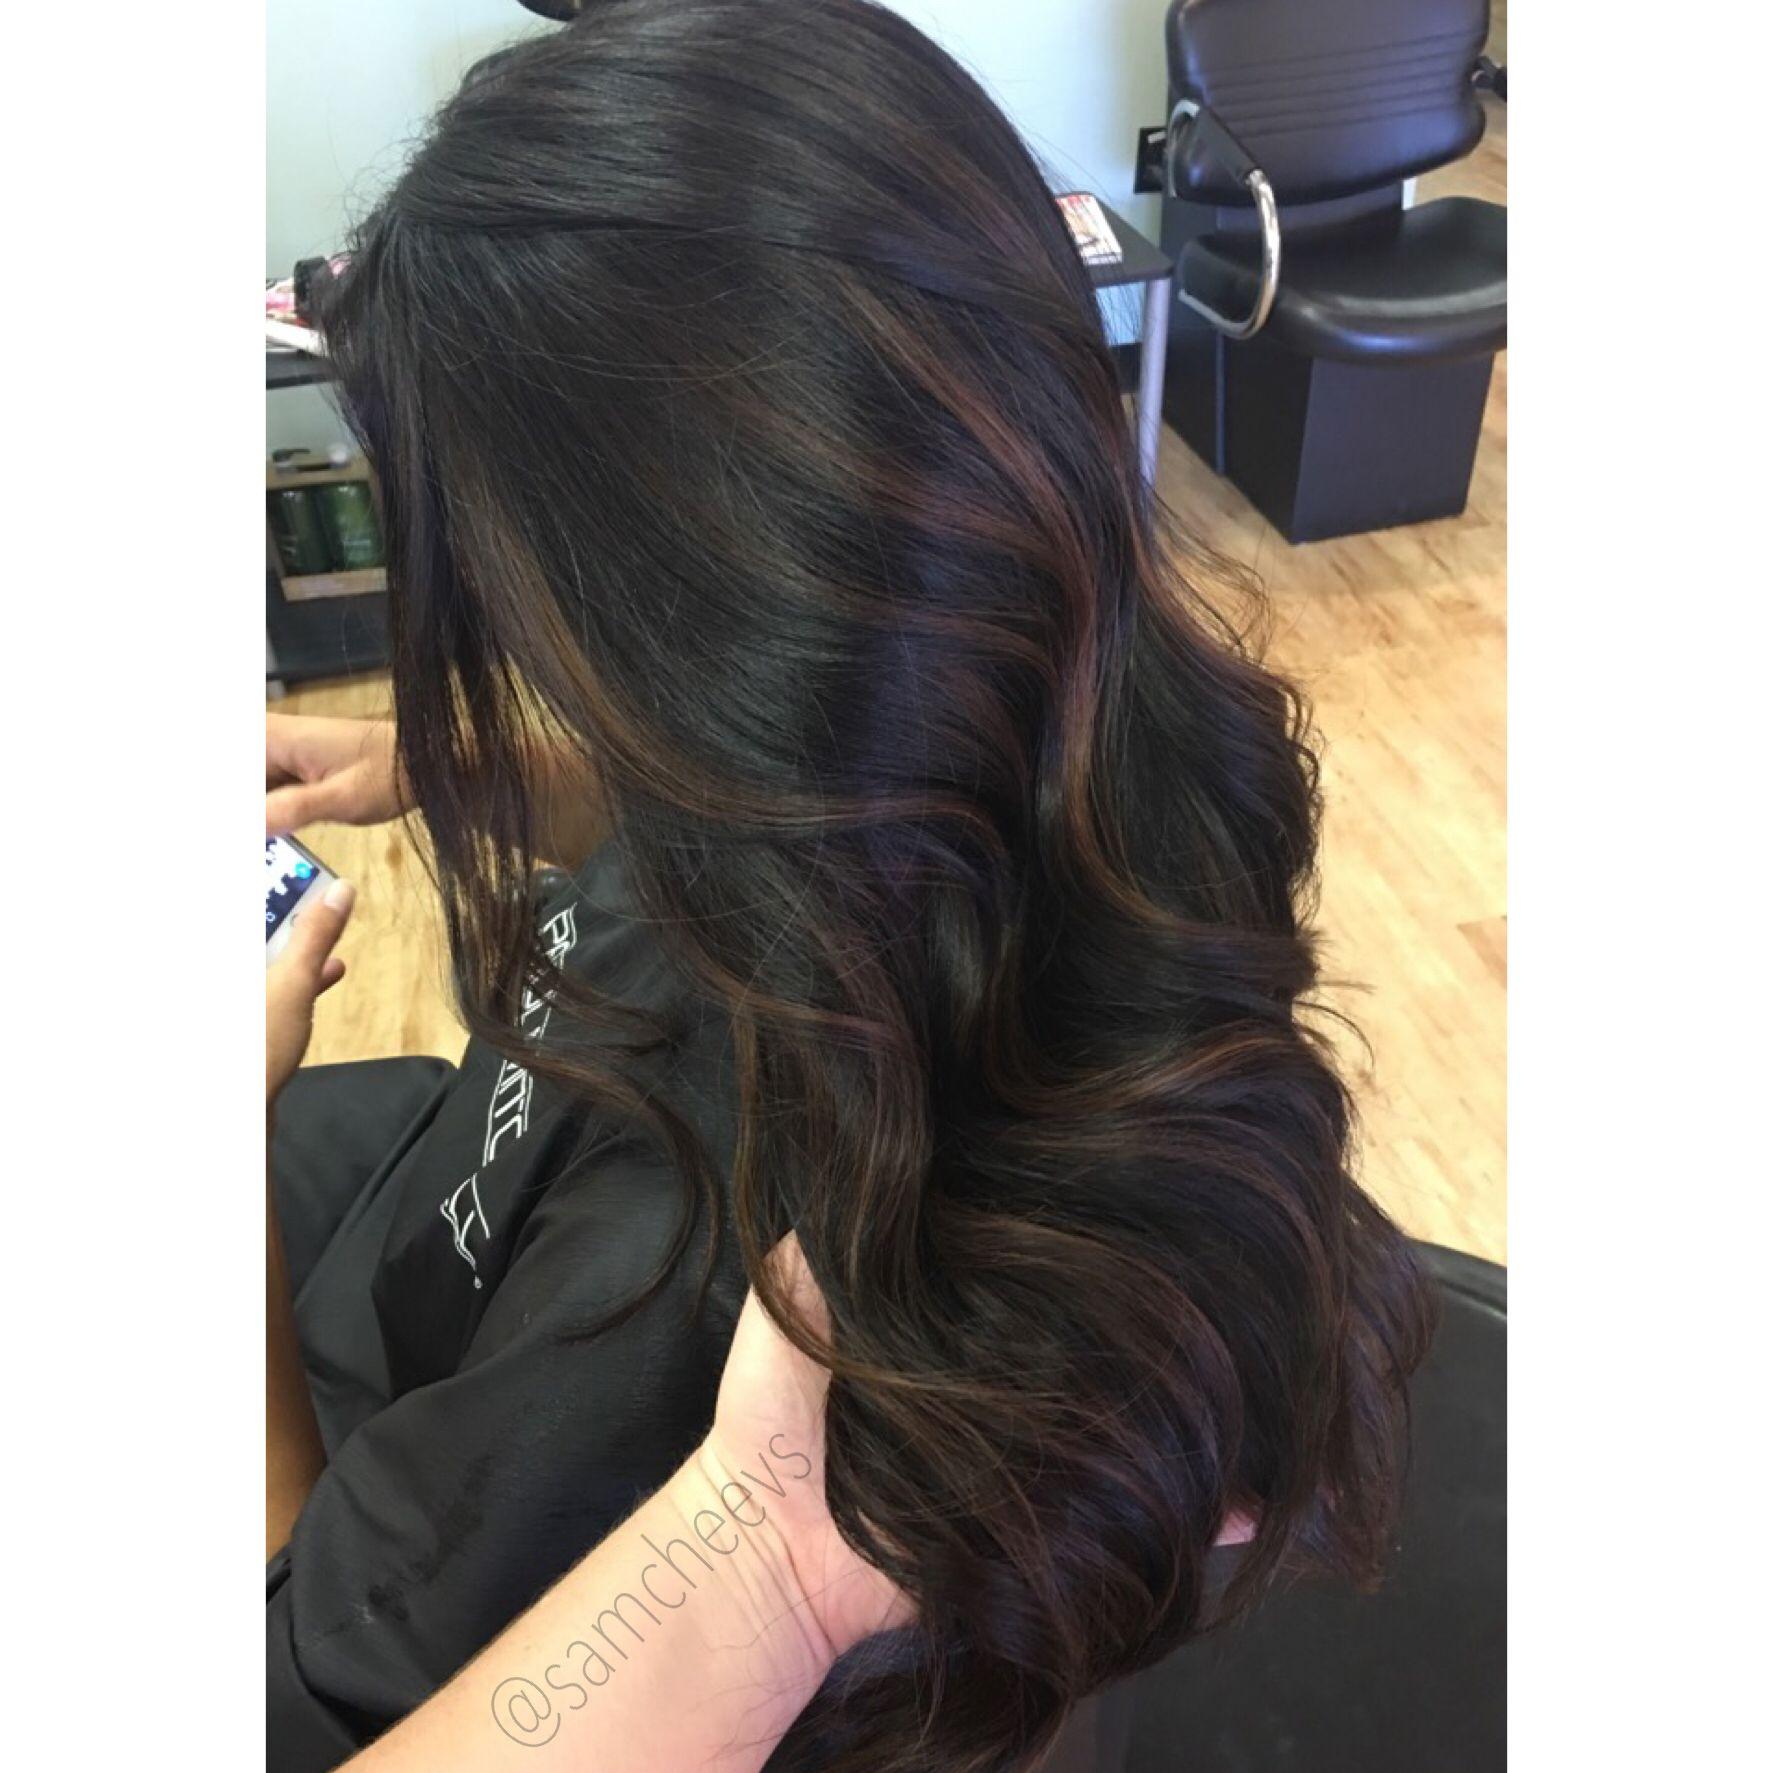 Caramel Highlights For Dark Hair Brown Balayage For Black Hair Instagram Samchee Hair Color For Black Hair Dark Hair With Highlights Black Hair Balayage